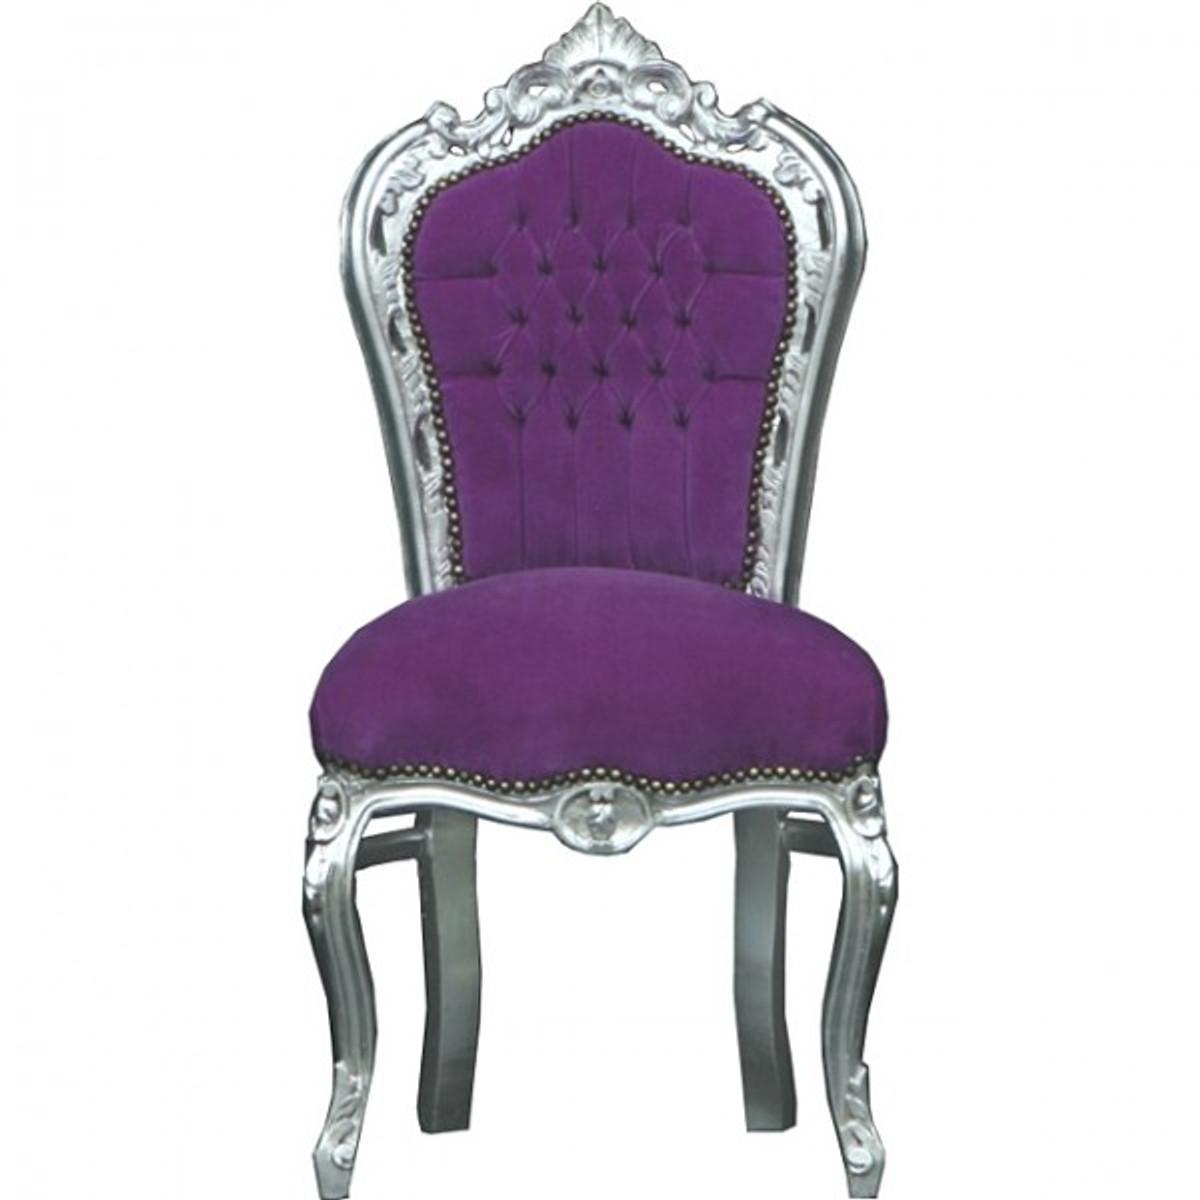 Casa Padrino Barock Esszimmer Stuhl Lila/Silber - Möbel 1